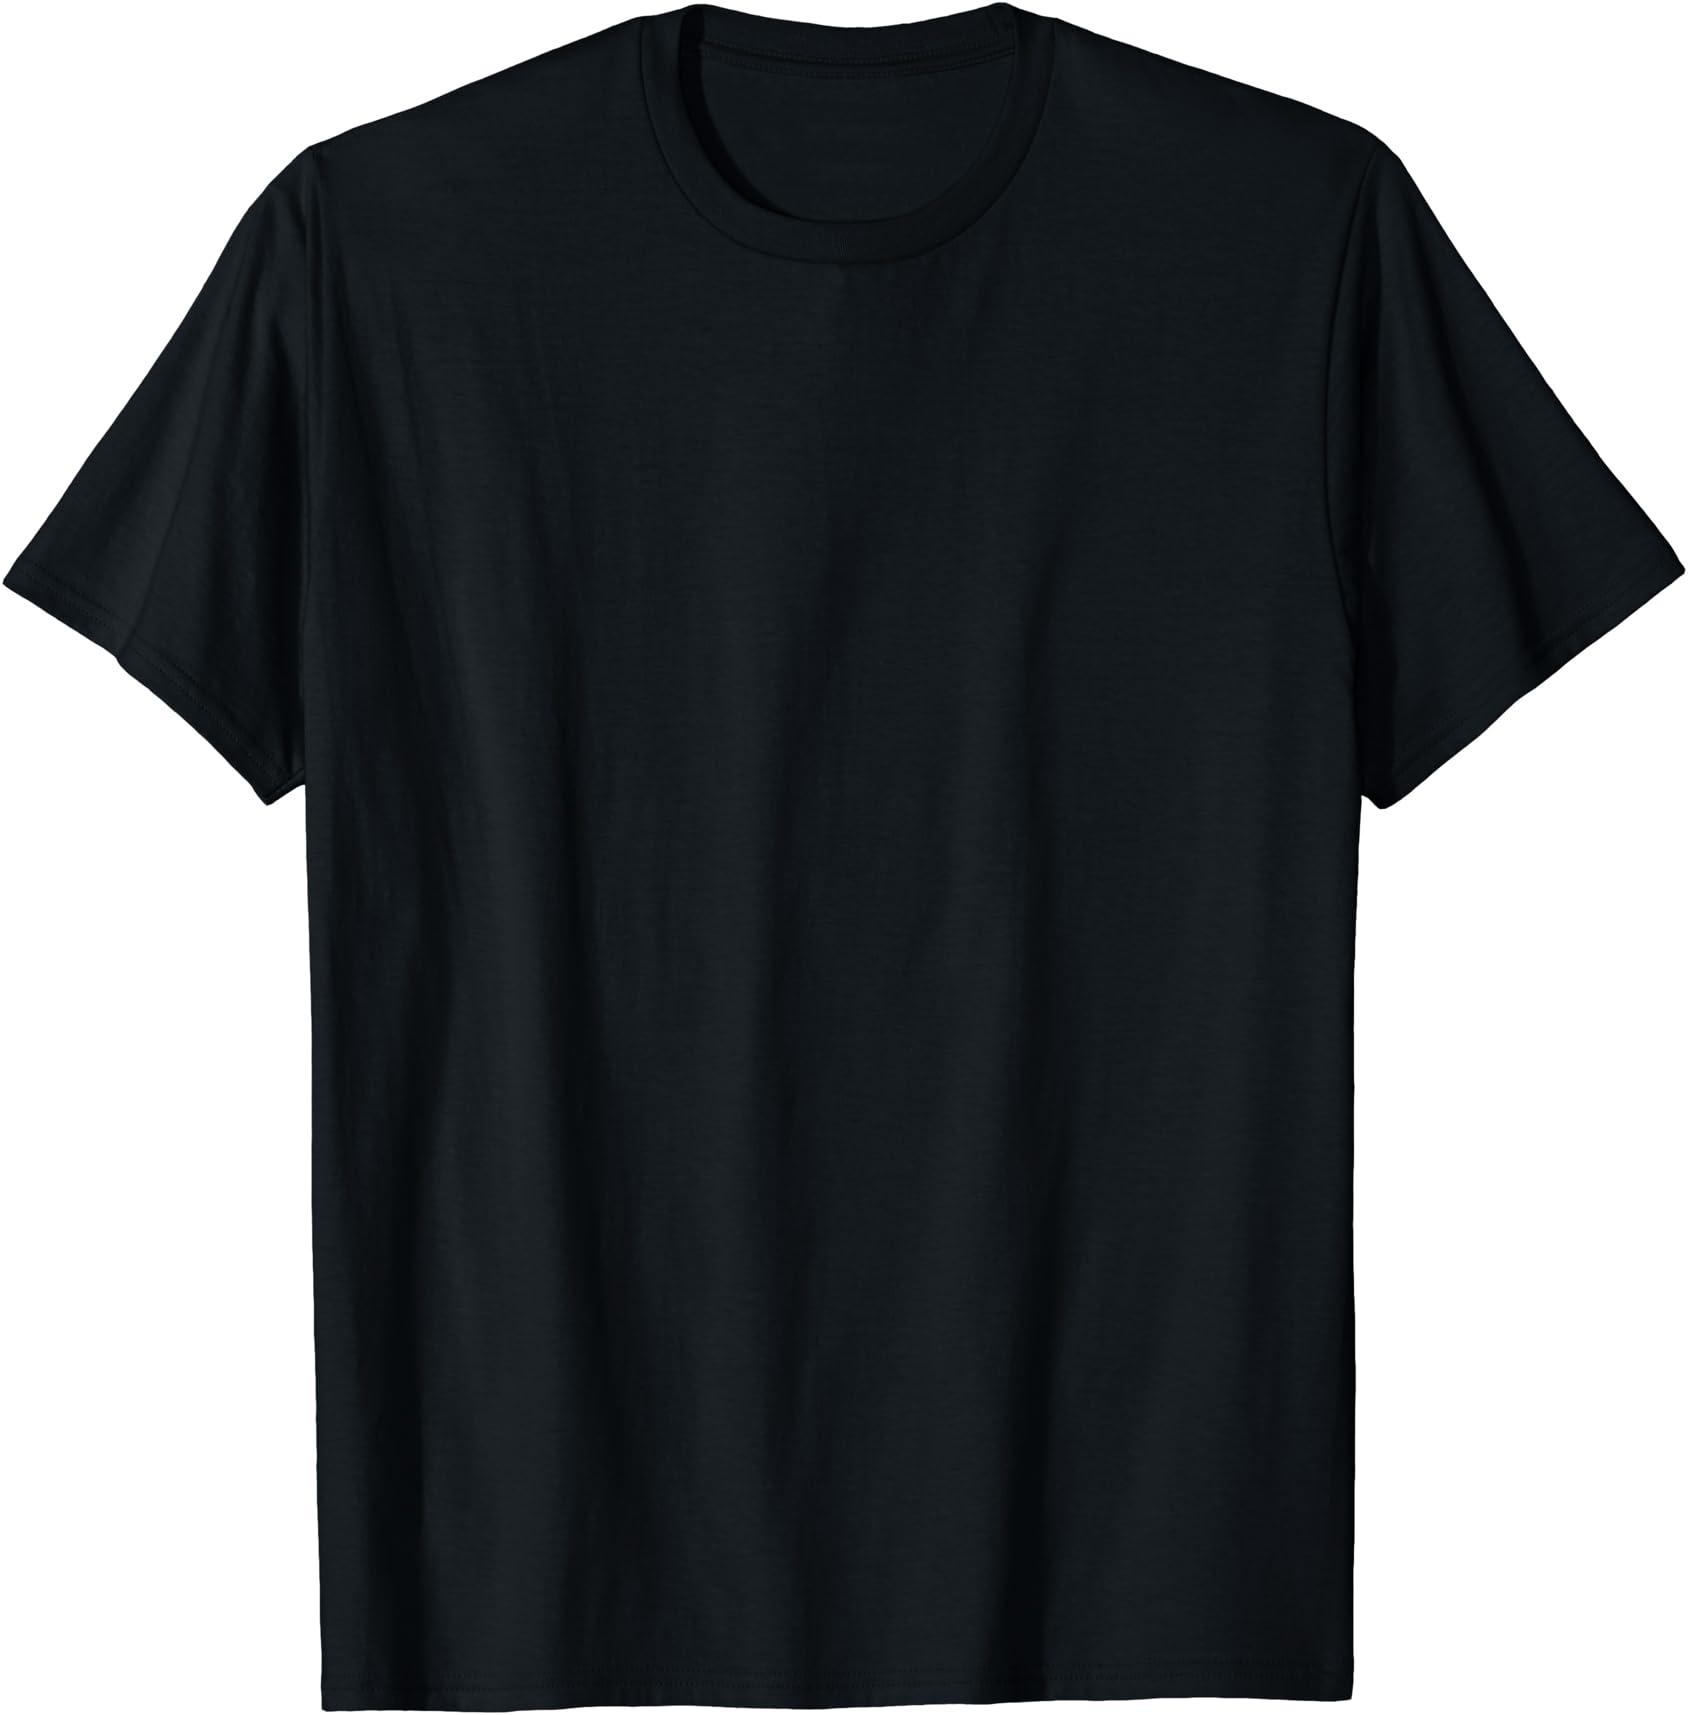 Mens Funny Sayings Slogans tshirts /& Tops-You Rock..You Rule T-Shirt